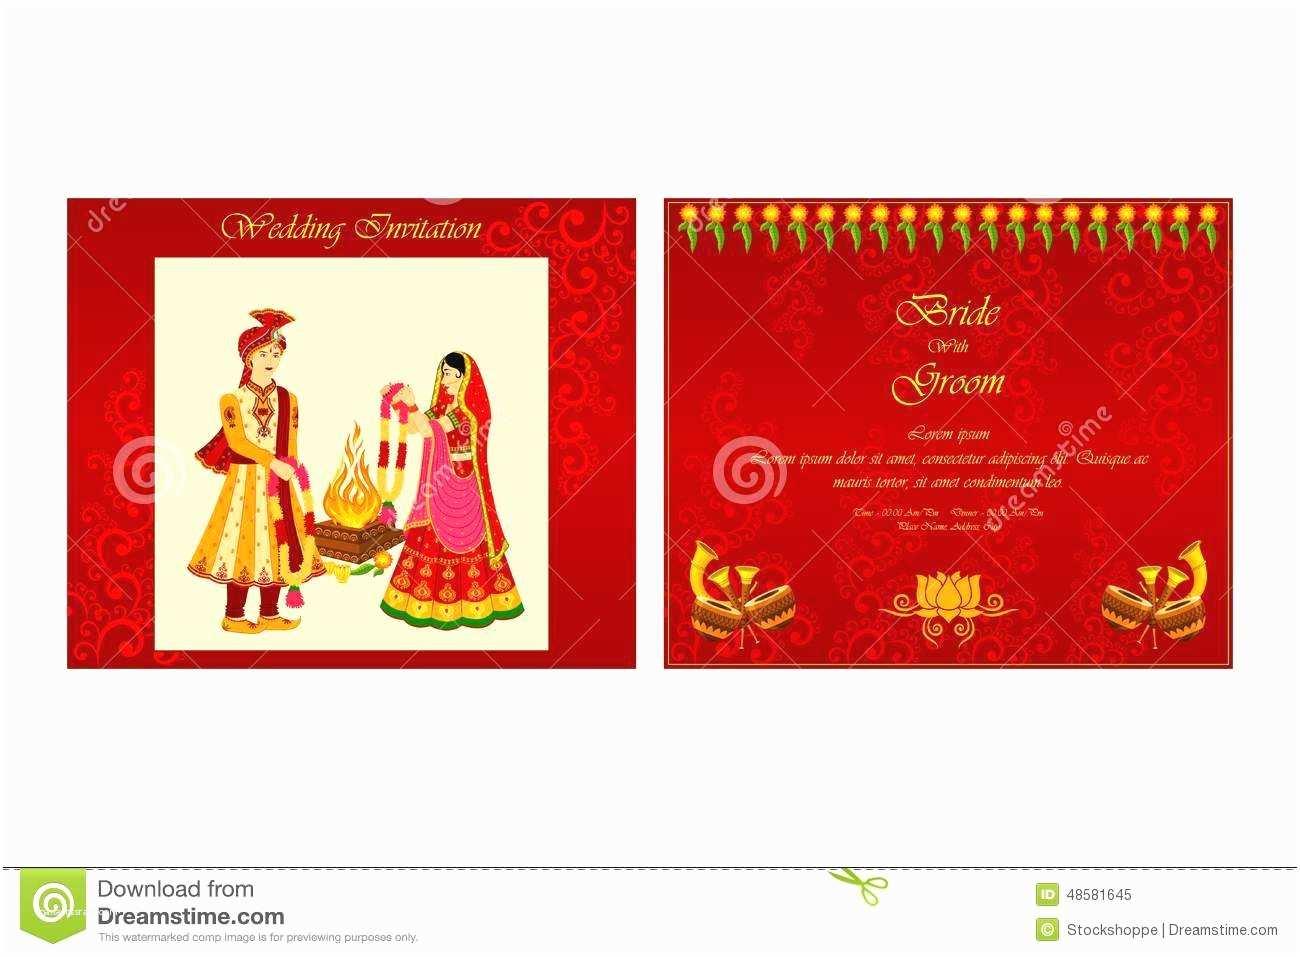 Online Editable Wedding Invitation Cards Free Download Indian Wedding Invitation Card Stock Vector